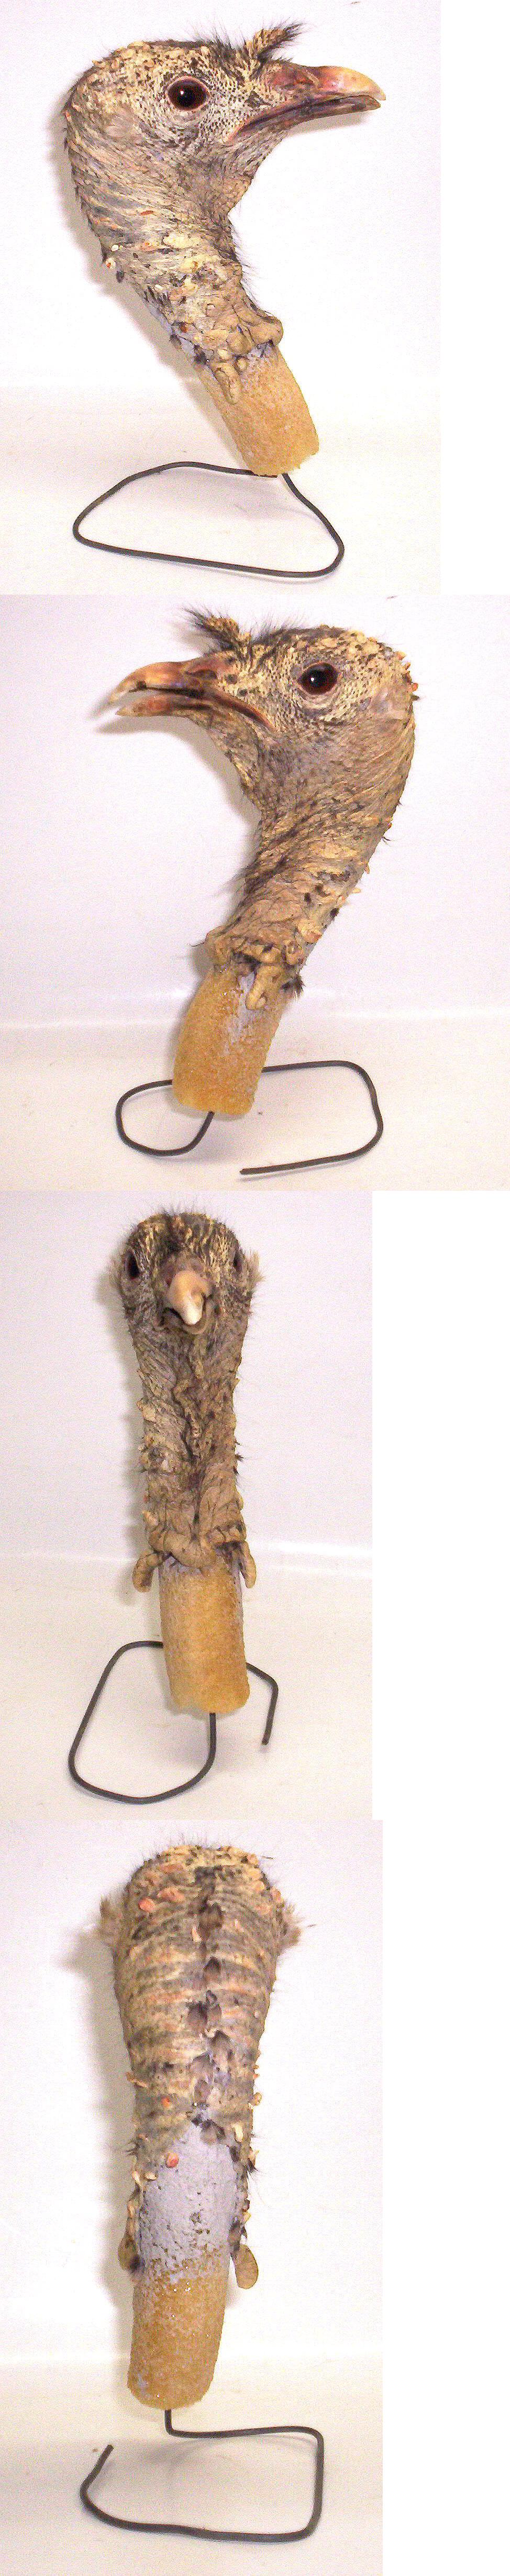 Birds 71123: Nos Freezed Dried Wild Turkey Taxidermy Mount Head Unpainted Alert Upright Pose -> BUY IT NOW ONLY: $60 on eBay!